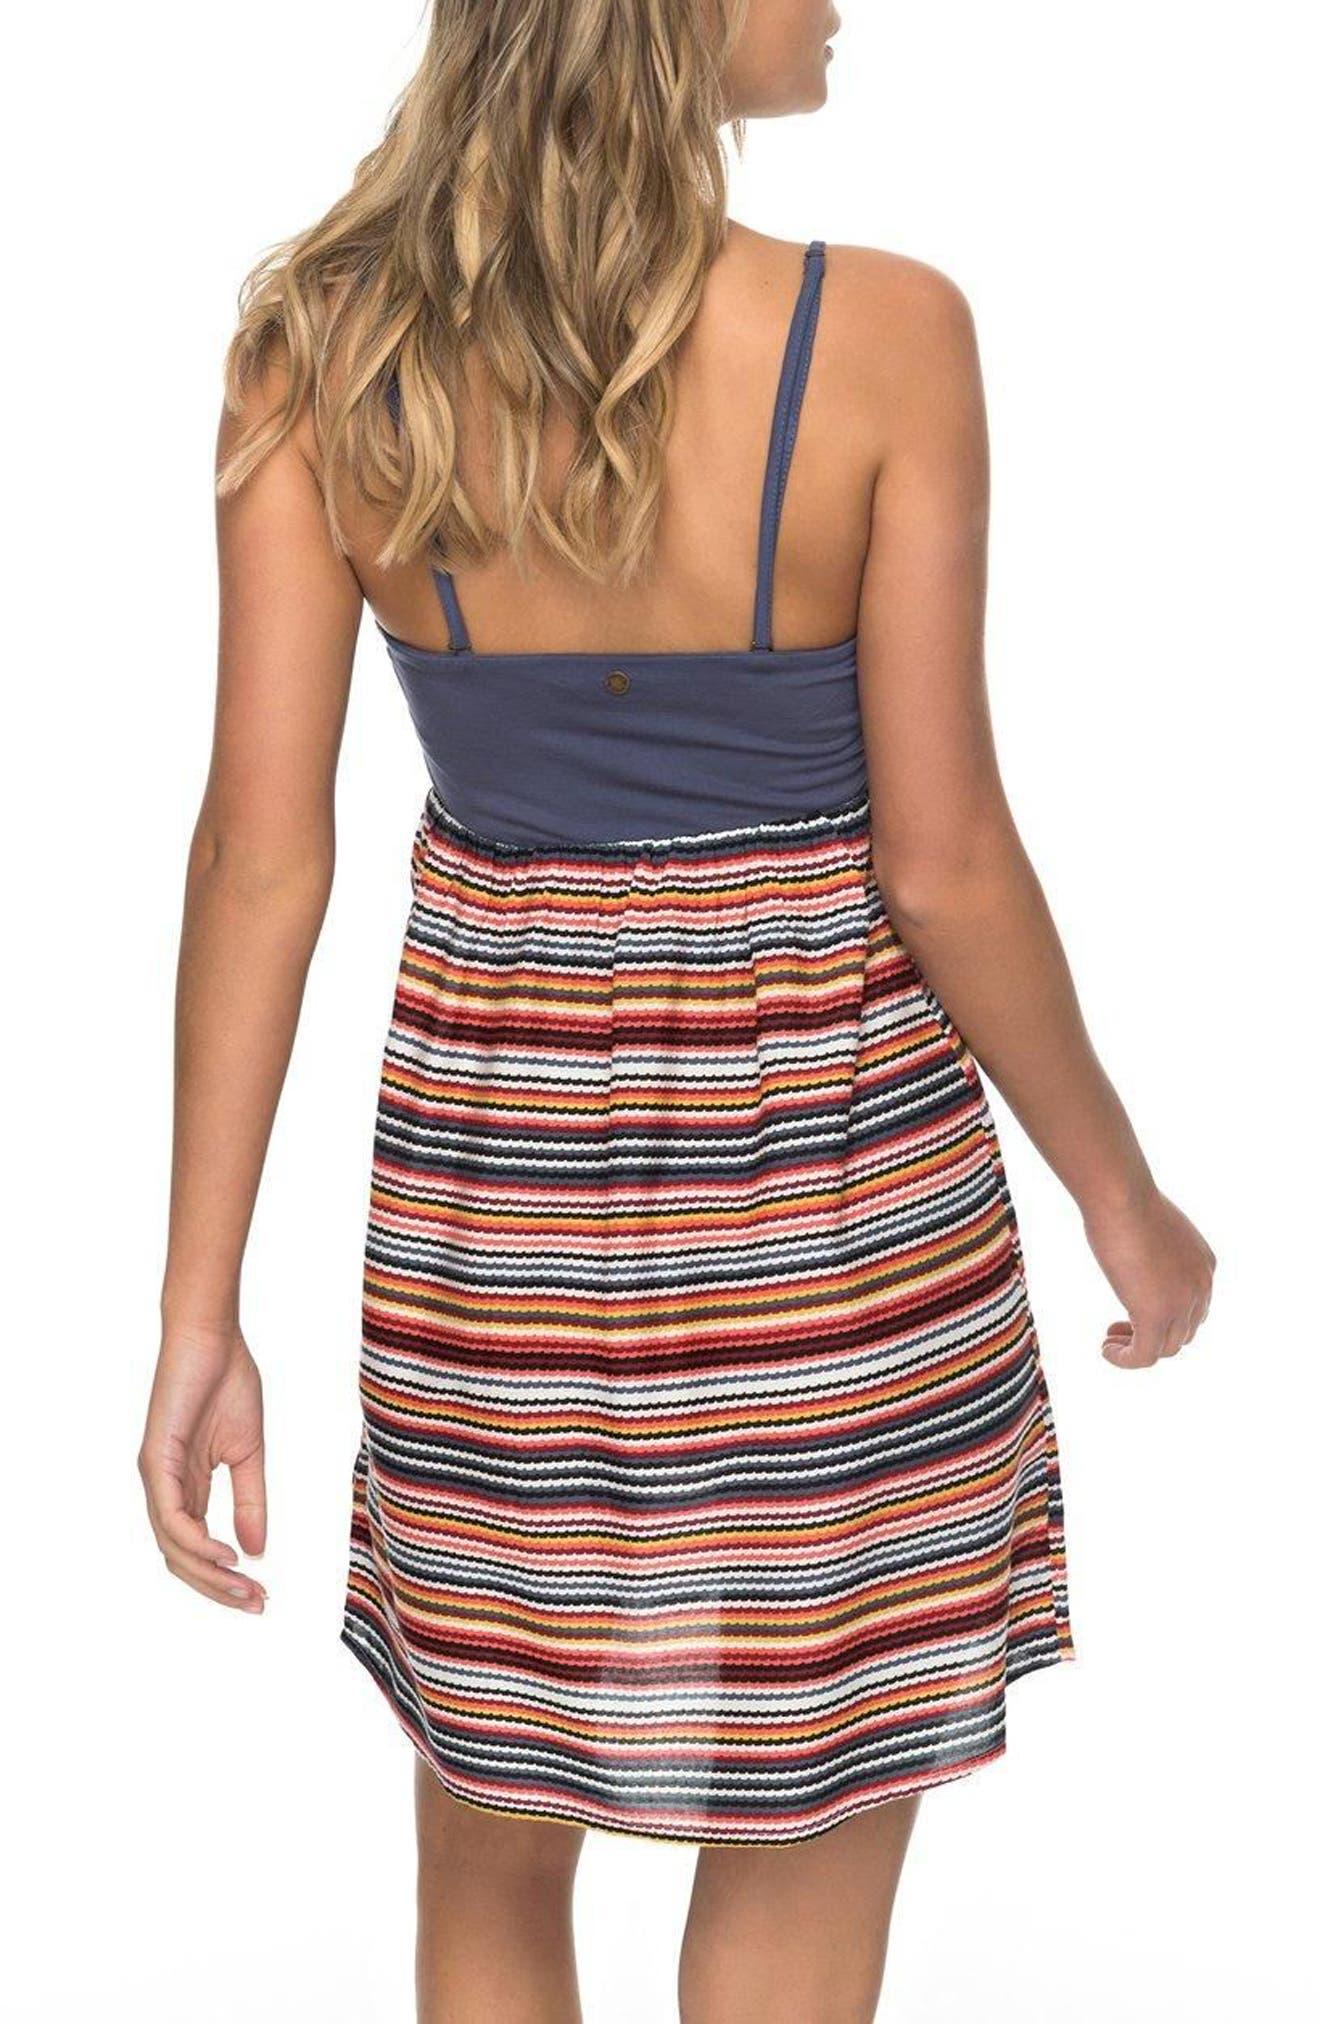 Ocean Romance Strapless Dress,                             Alternate thumbnail 3, color,                             Rio Red Zigzag Stripe